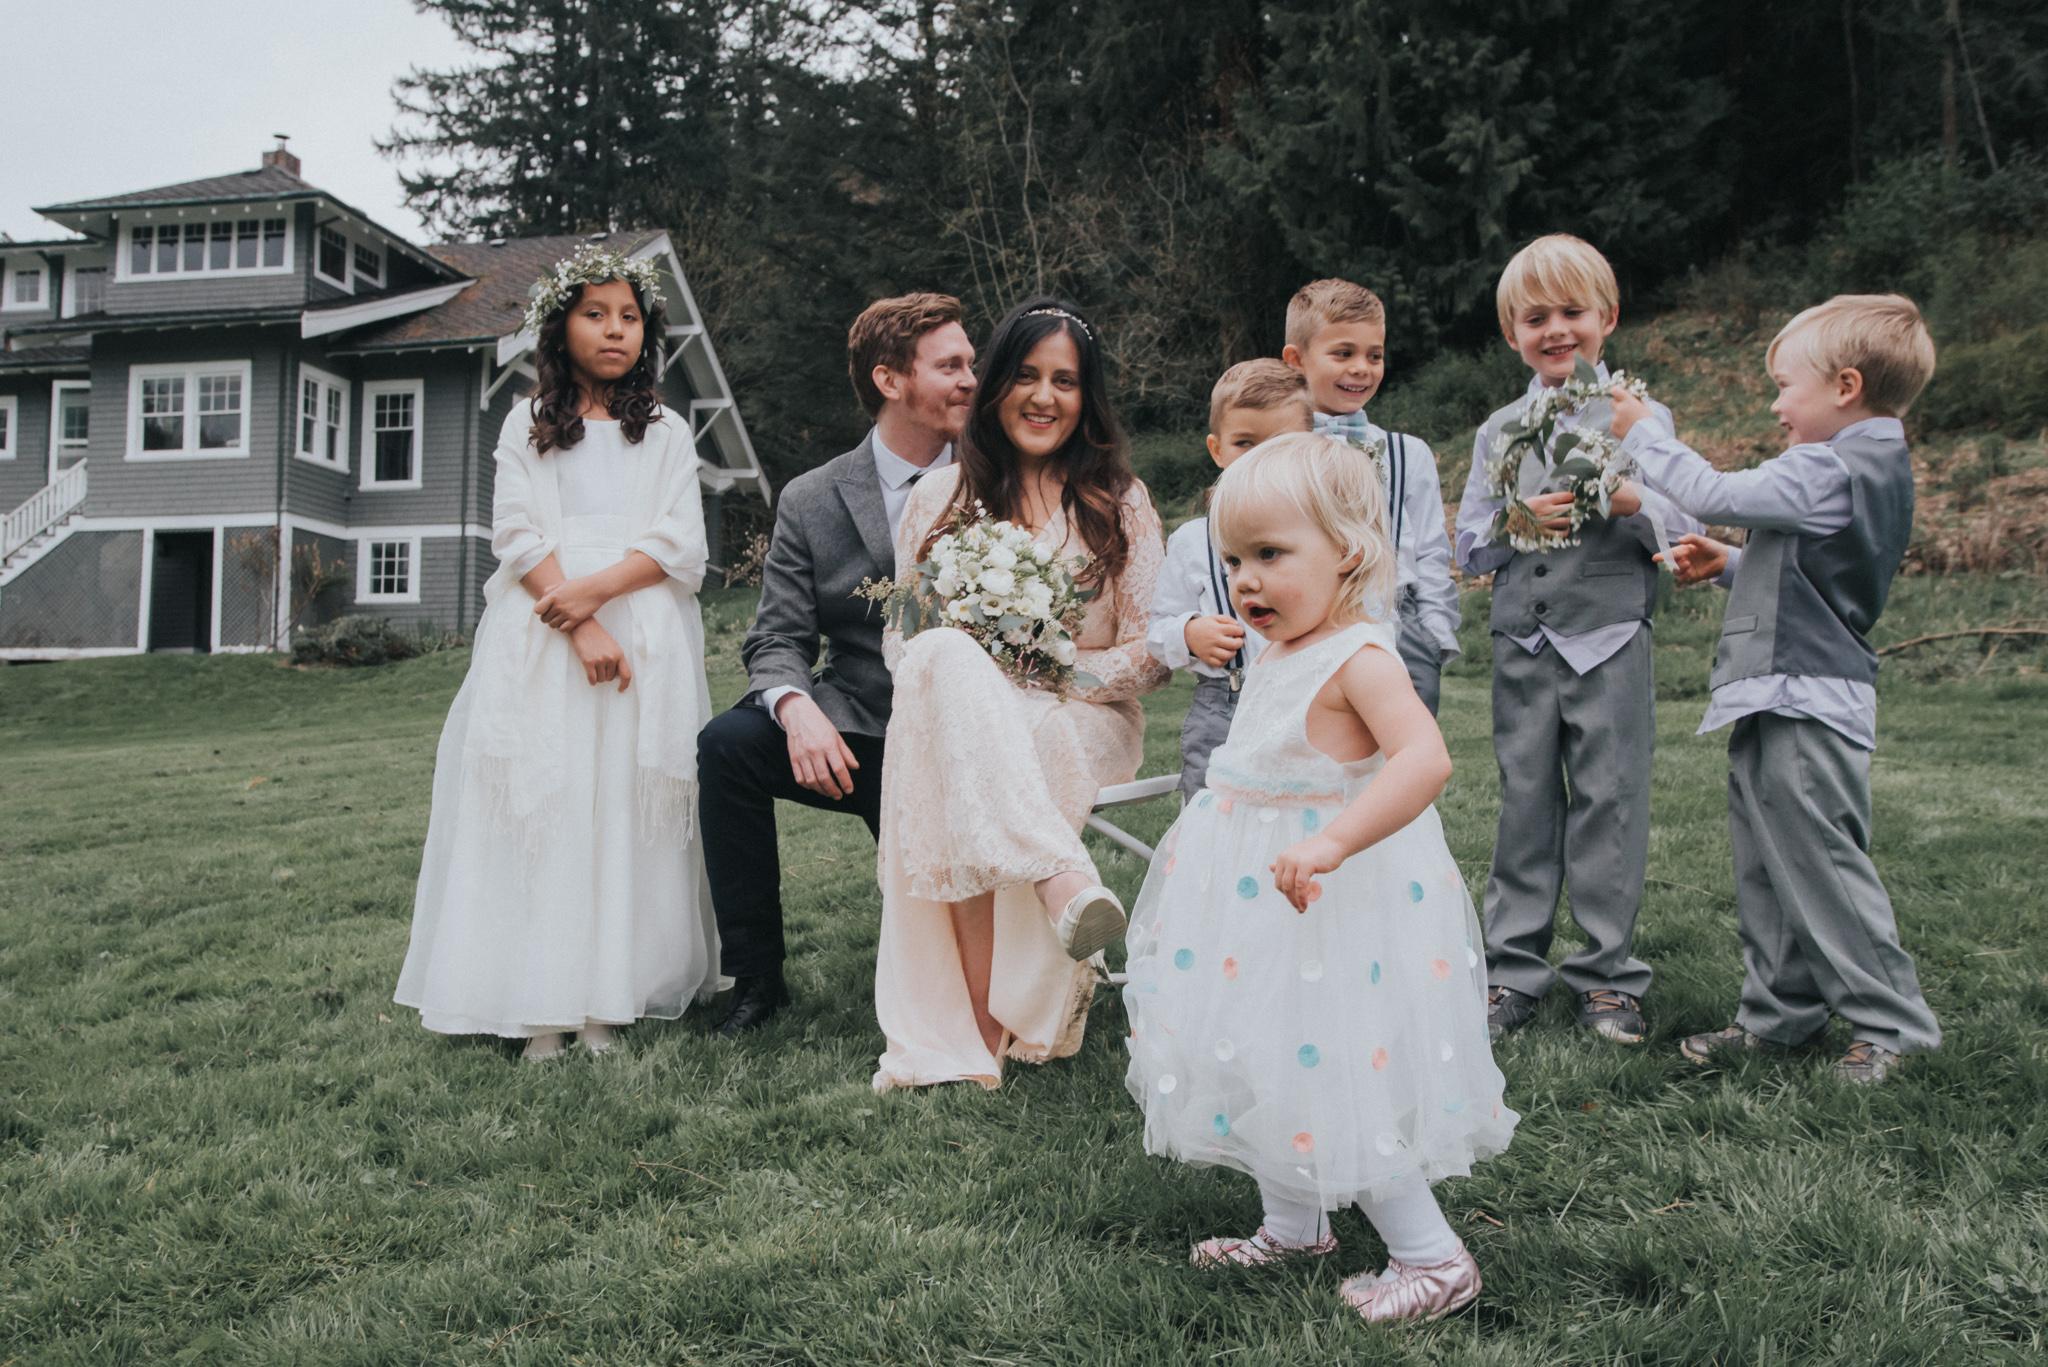 Bellingham wedding Woodstock Farms Vishal Goklani Seattle Wedding Photographer027.JPG